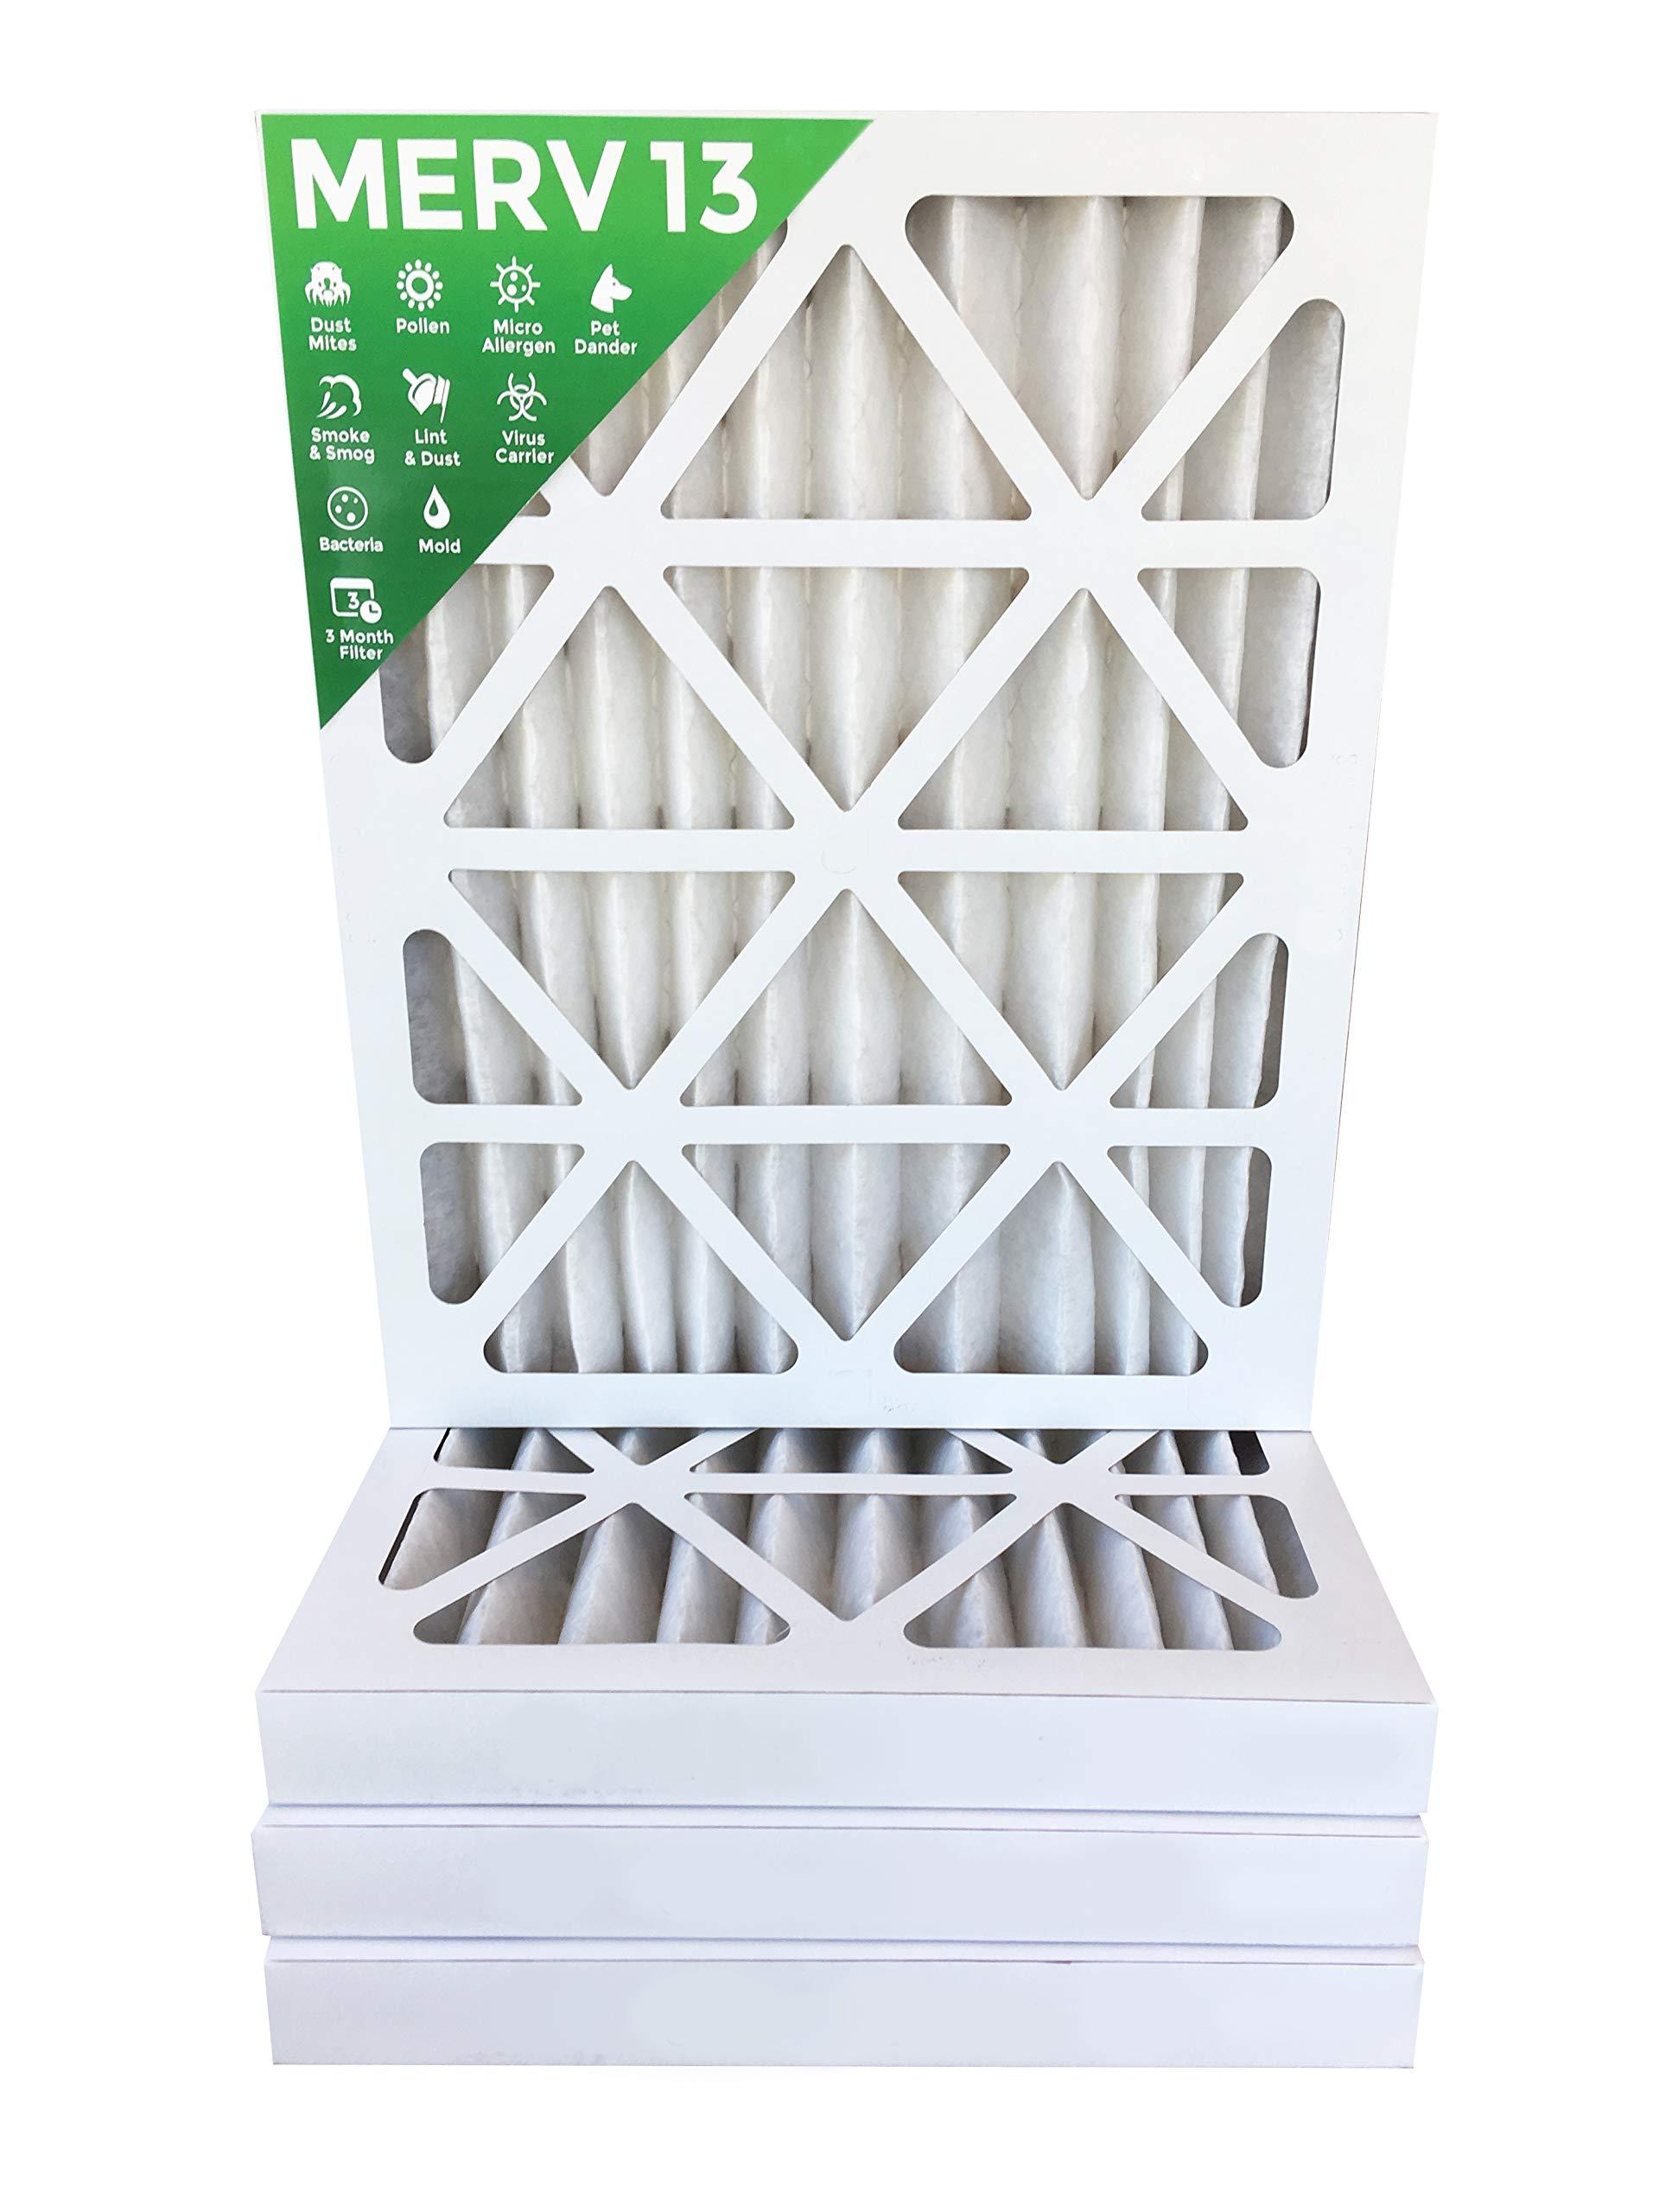 16x20x2 MERV 13 (MPR 2200) AC Furnace 2'' Inch Air Filters. Box of 4